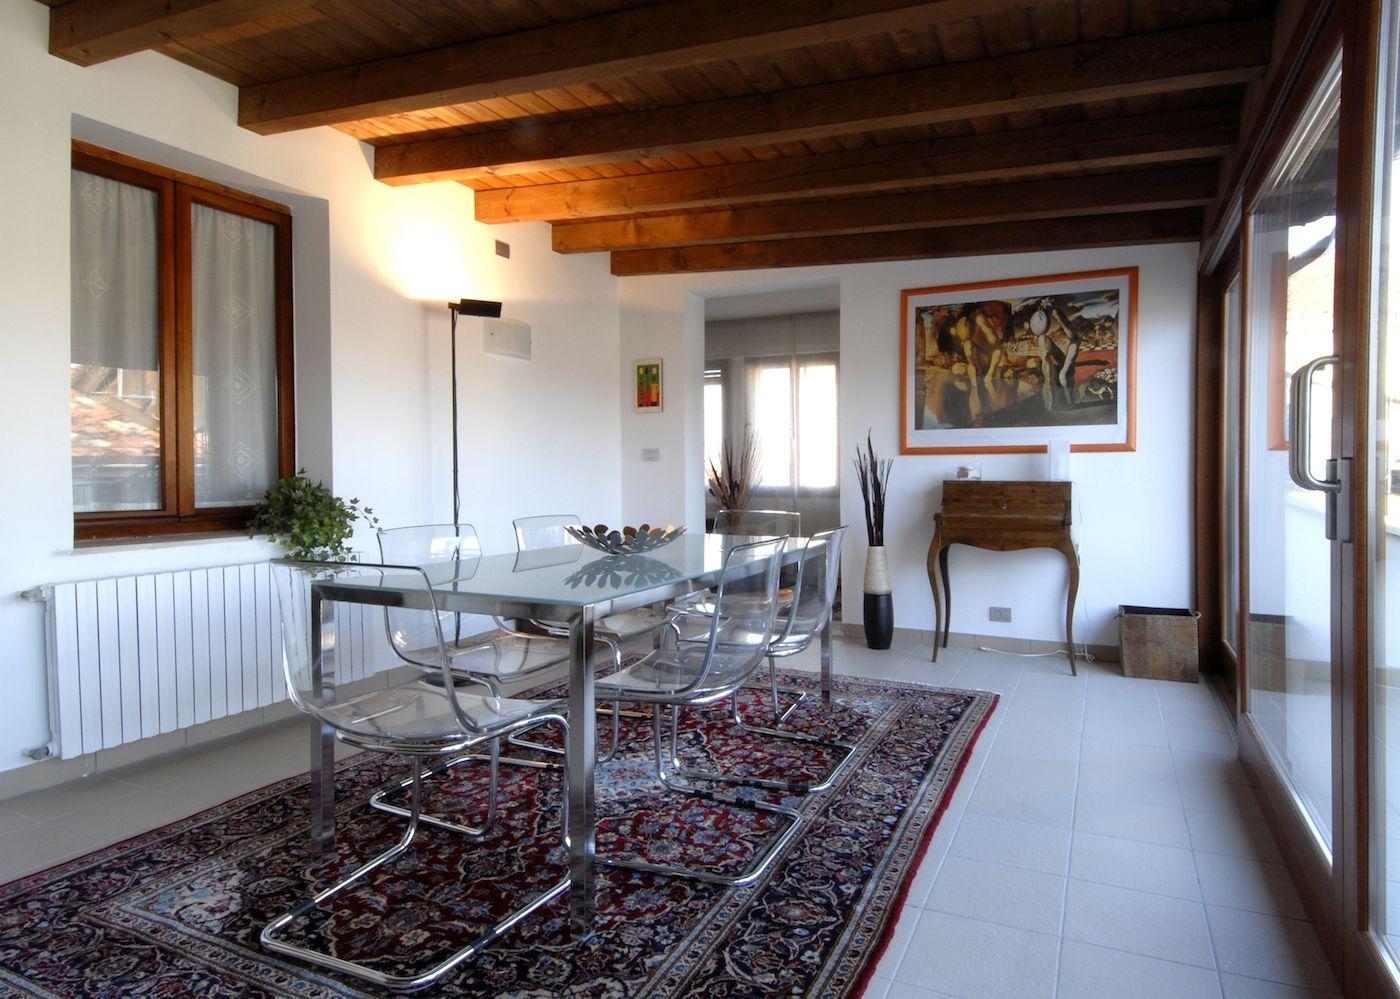 the veranda leads to living room, terrace and kithcen